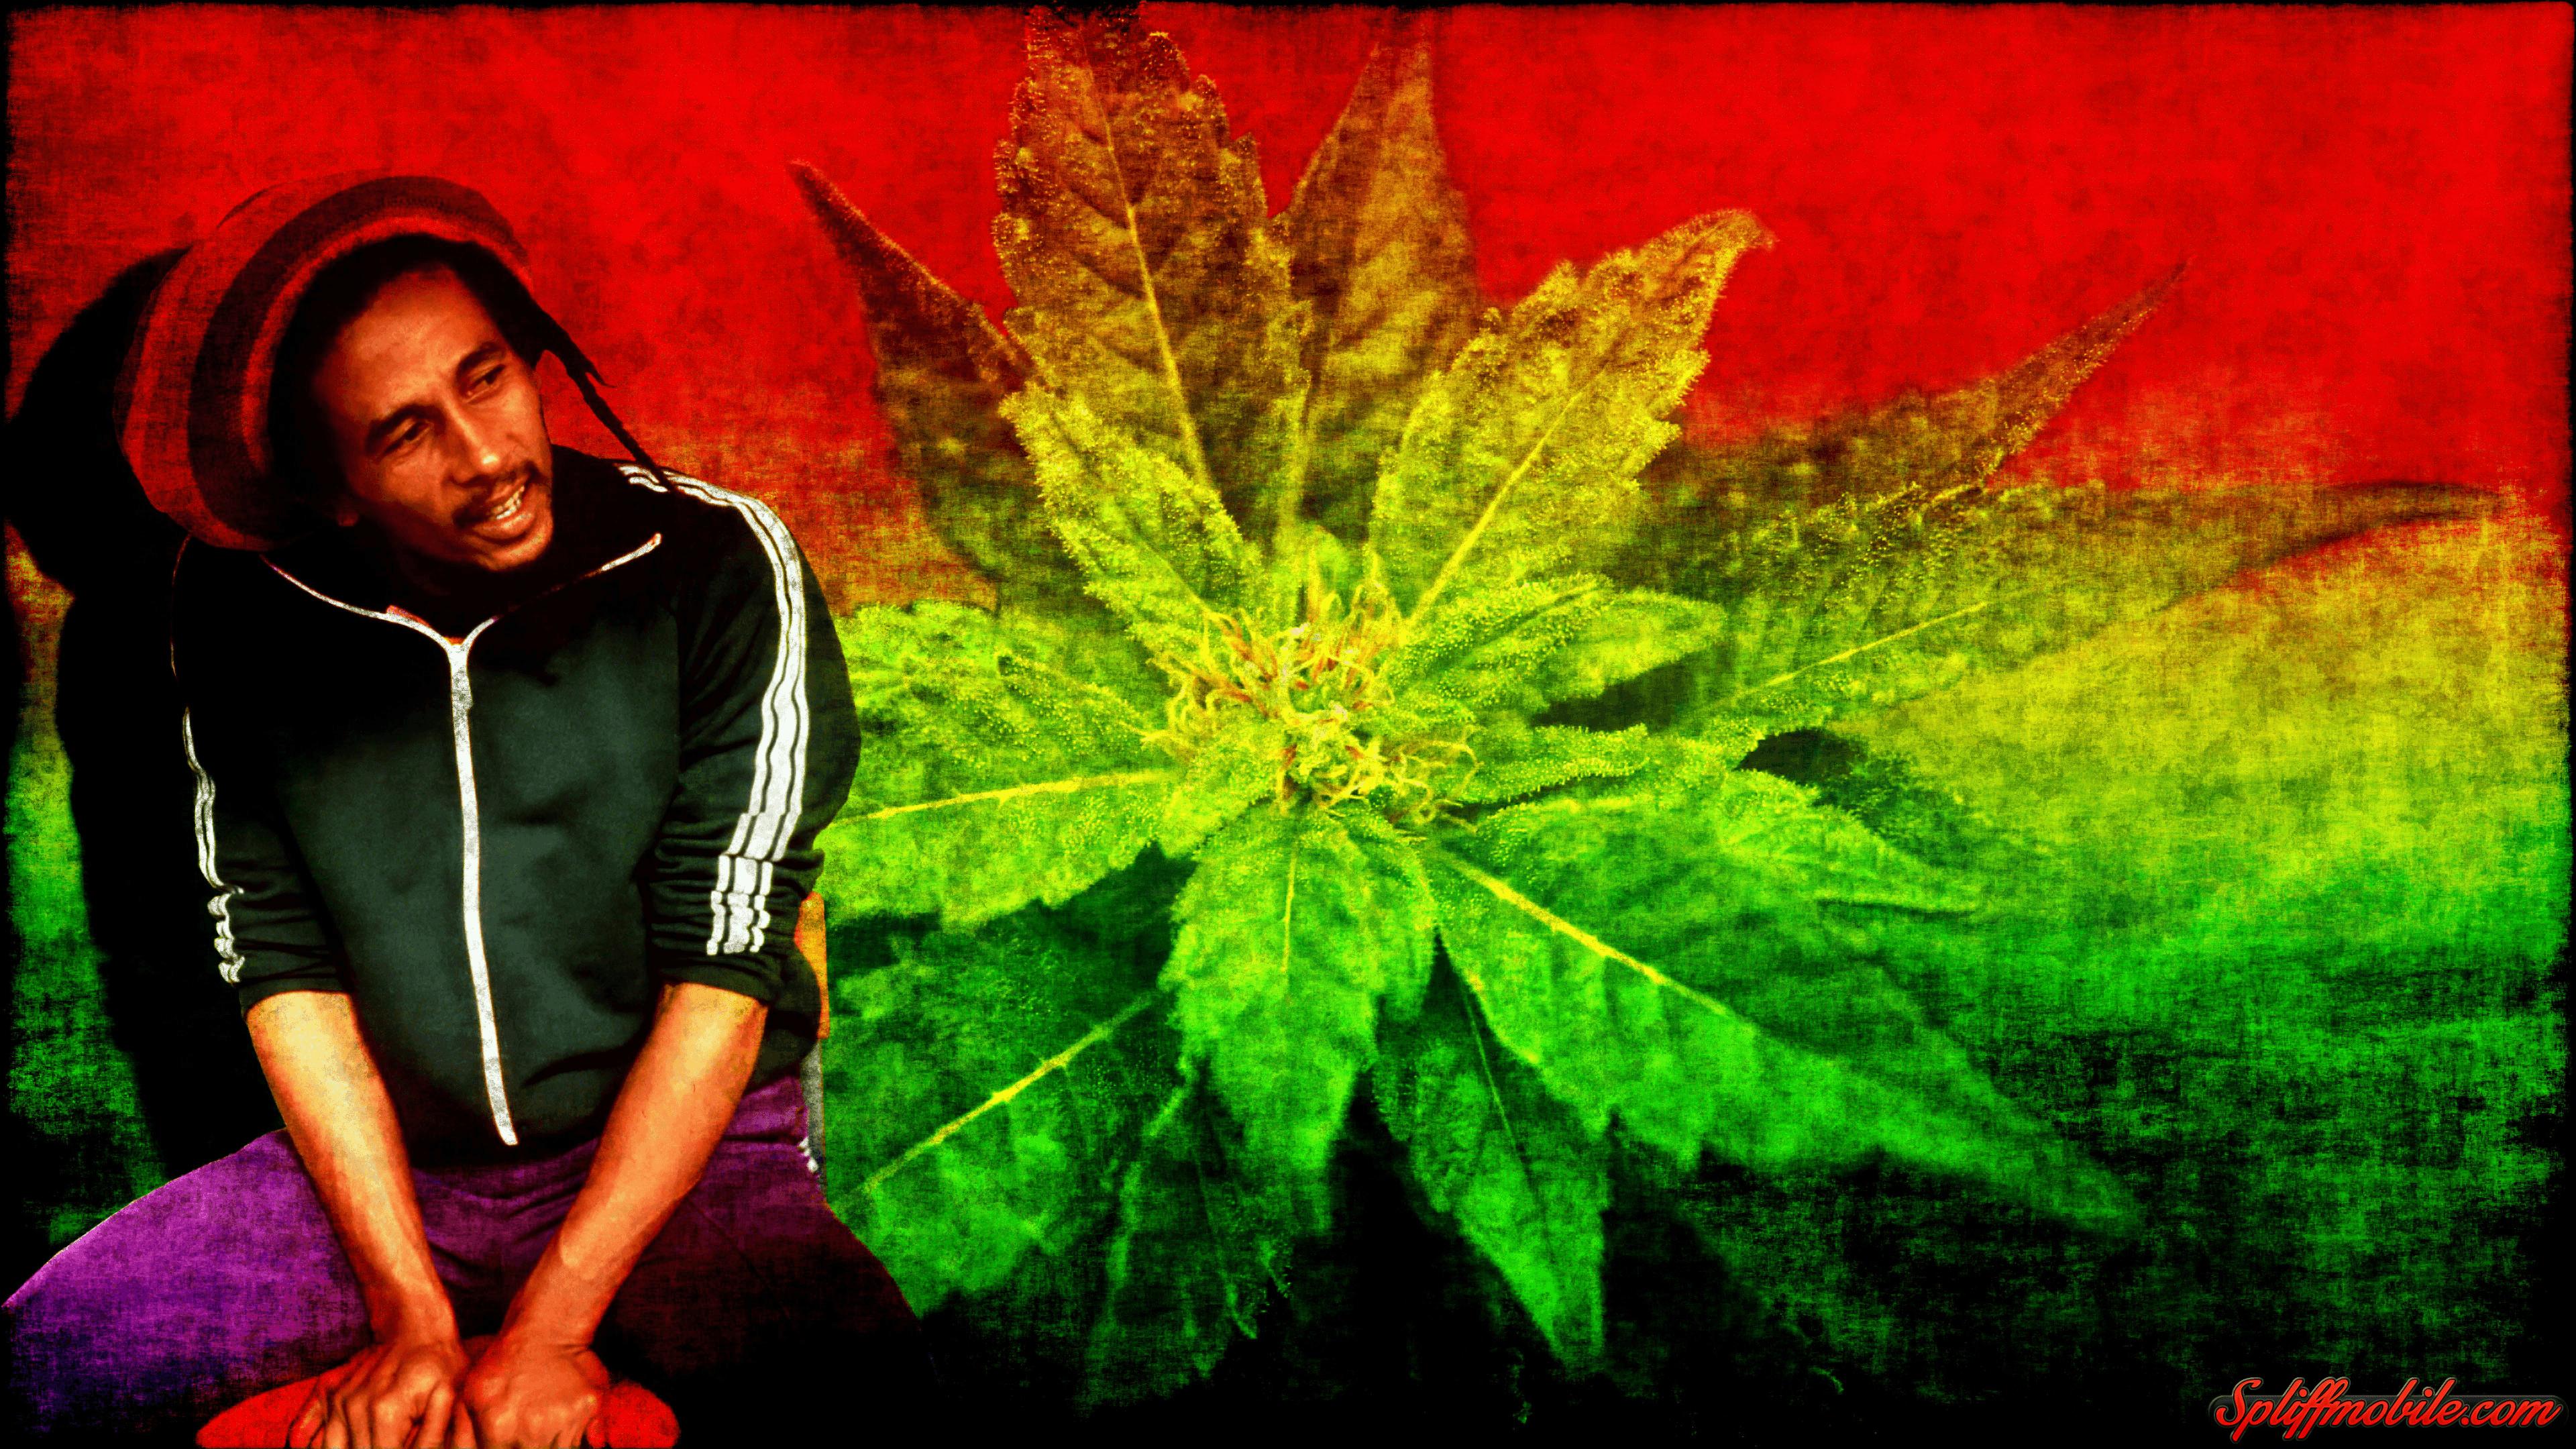 Bob Marley Wallpaper Backgrounds Wallpaper Cave